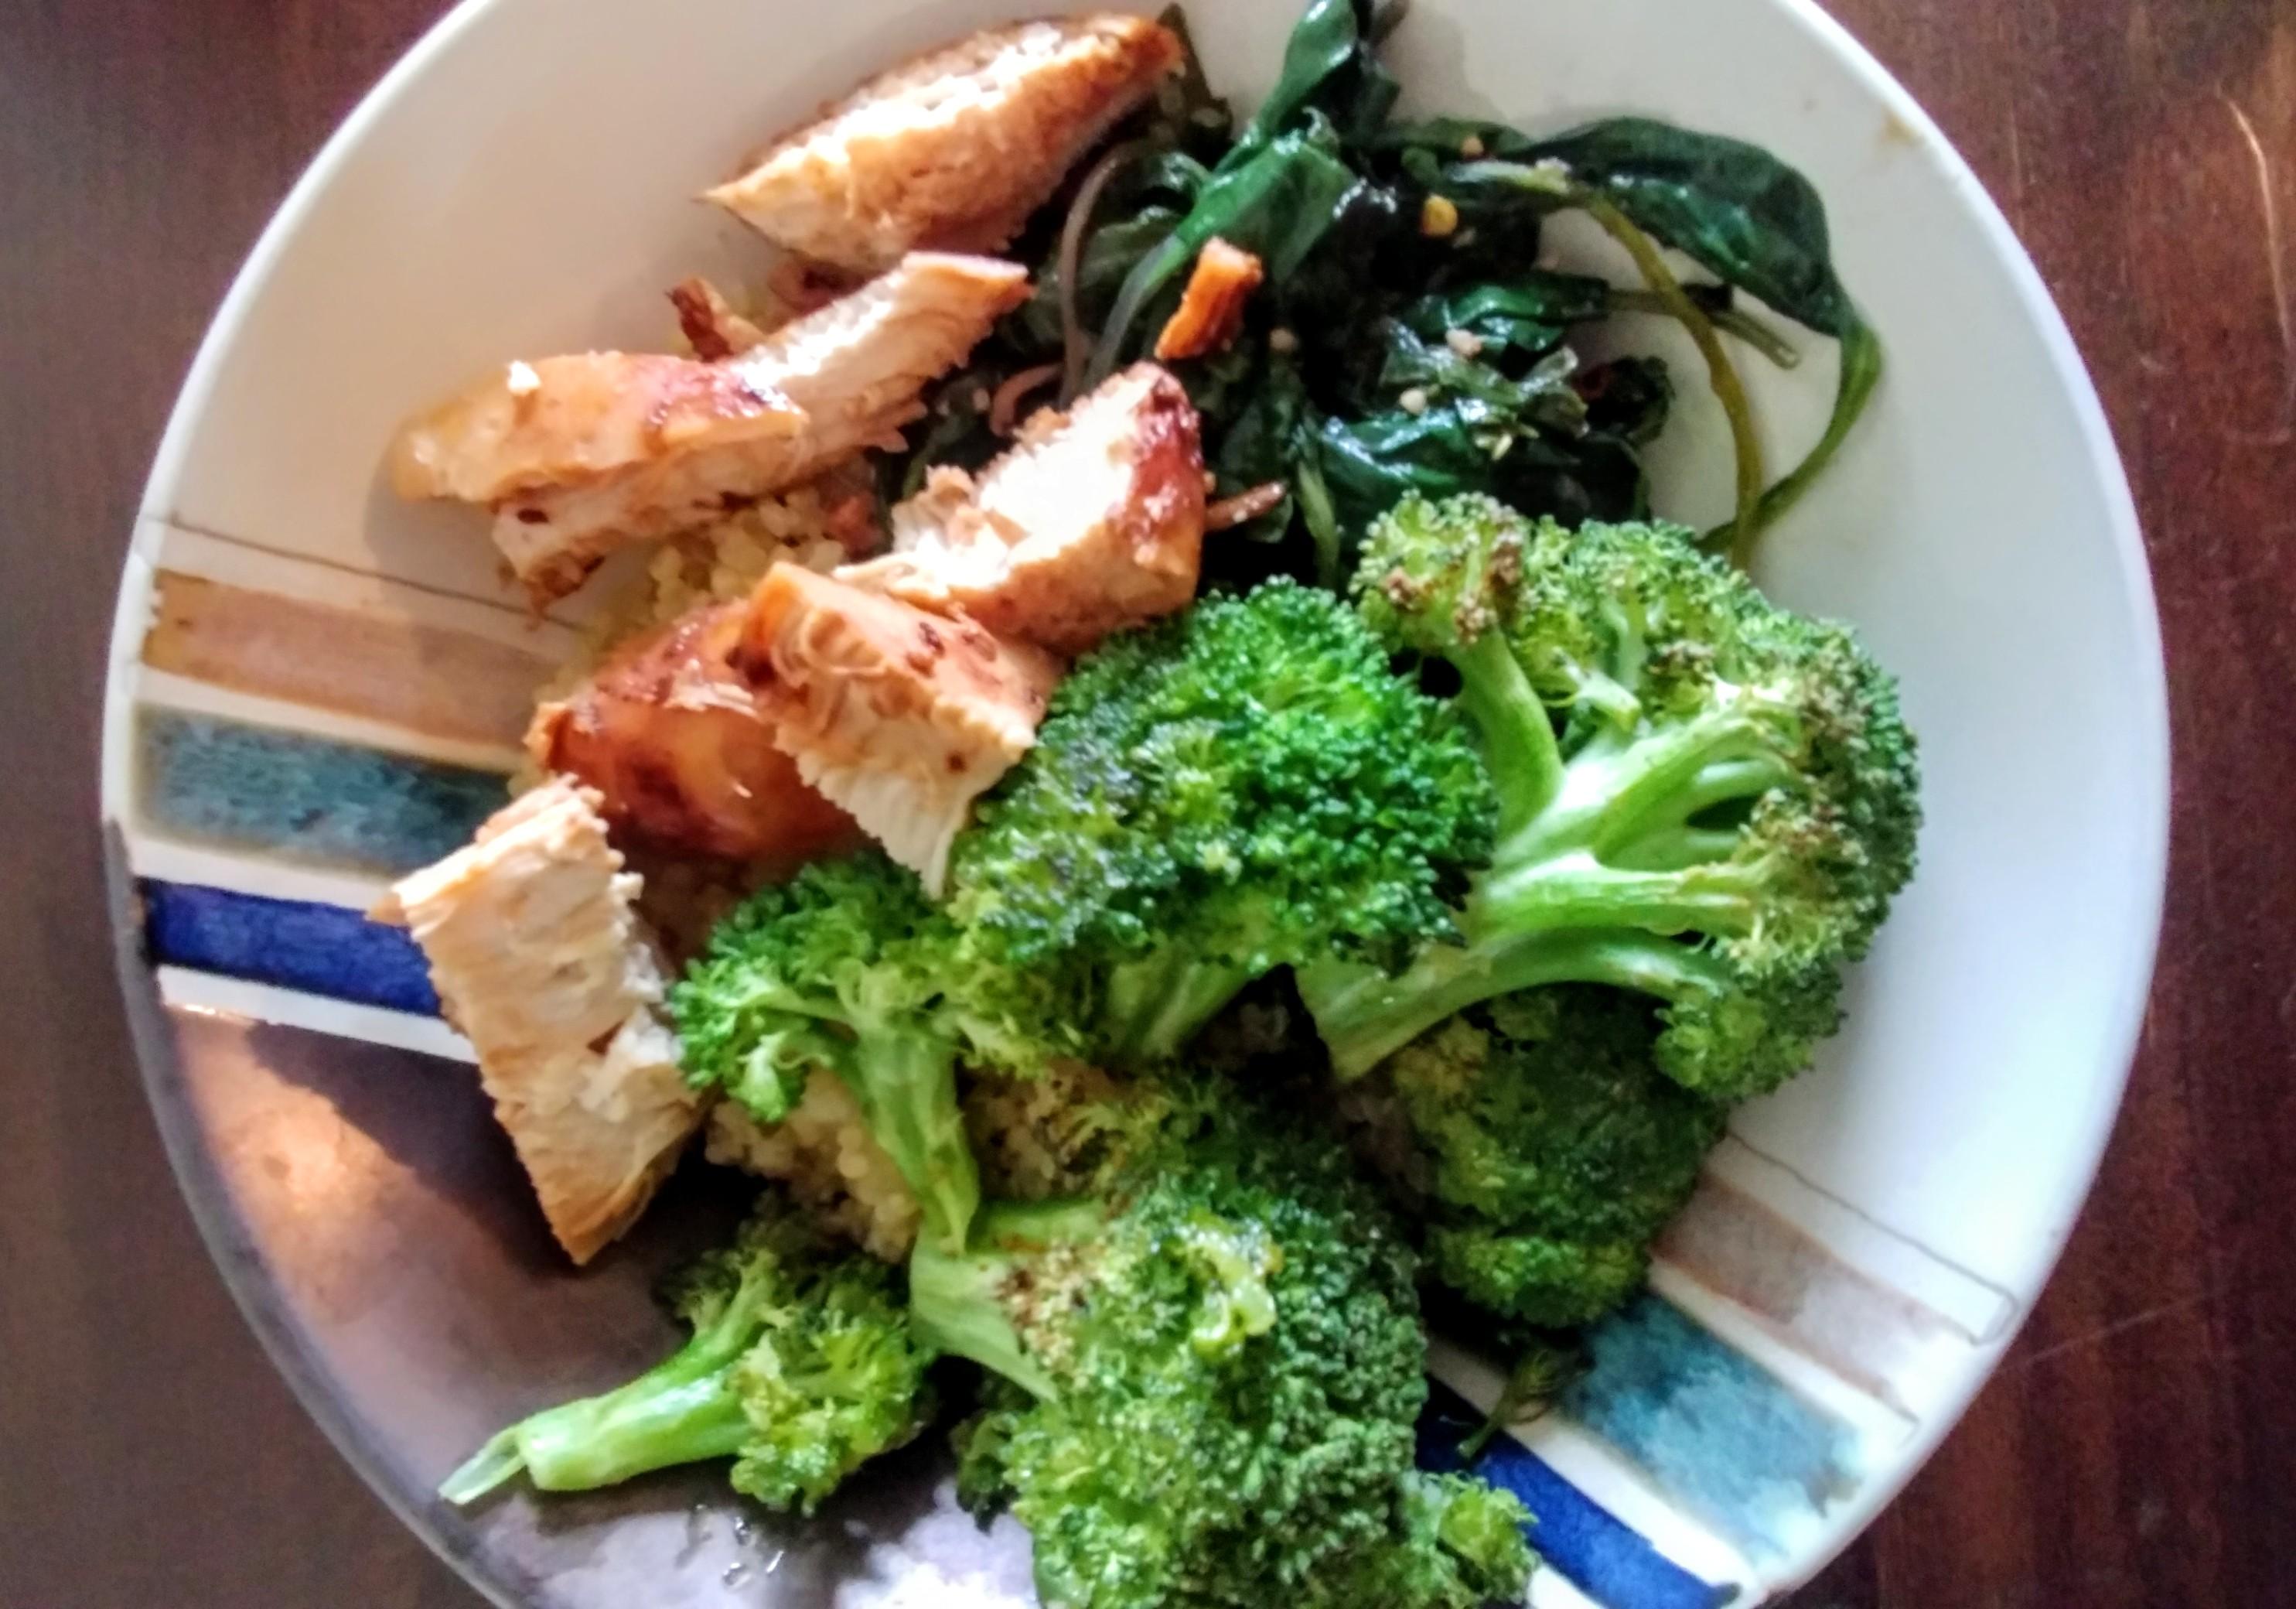 Teriyaki Chicken with roasted broccoli, sautéed garlicky spinach and quinoa bowl